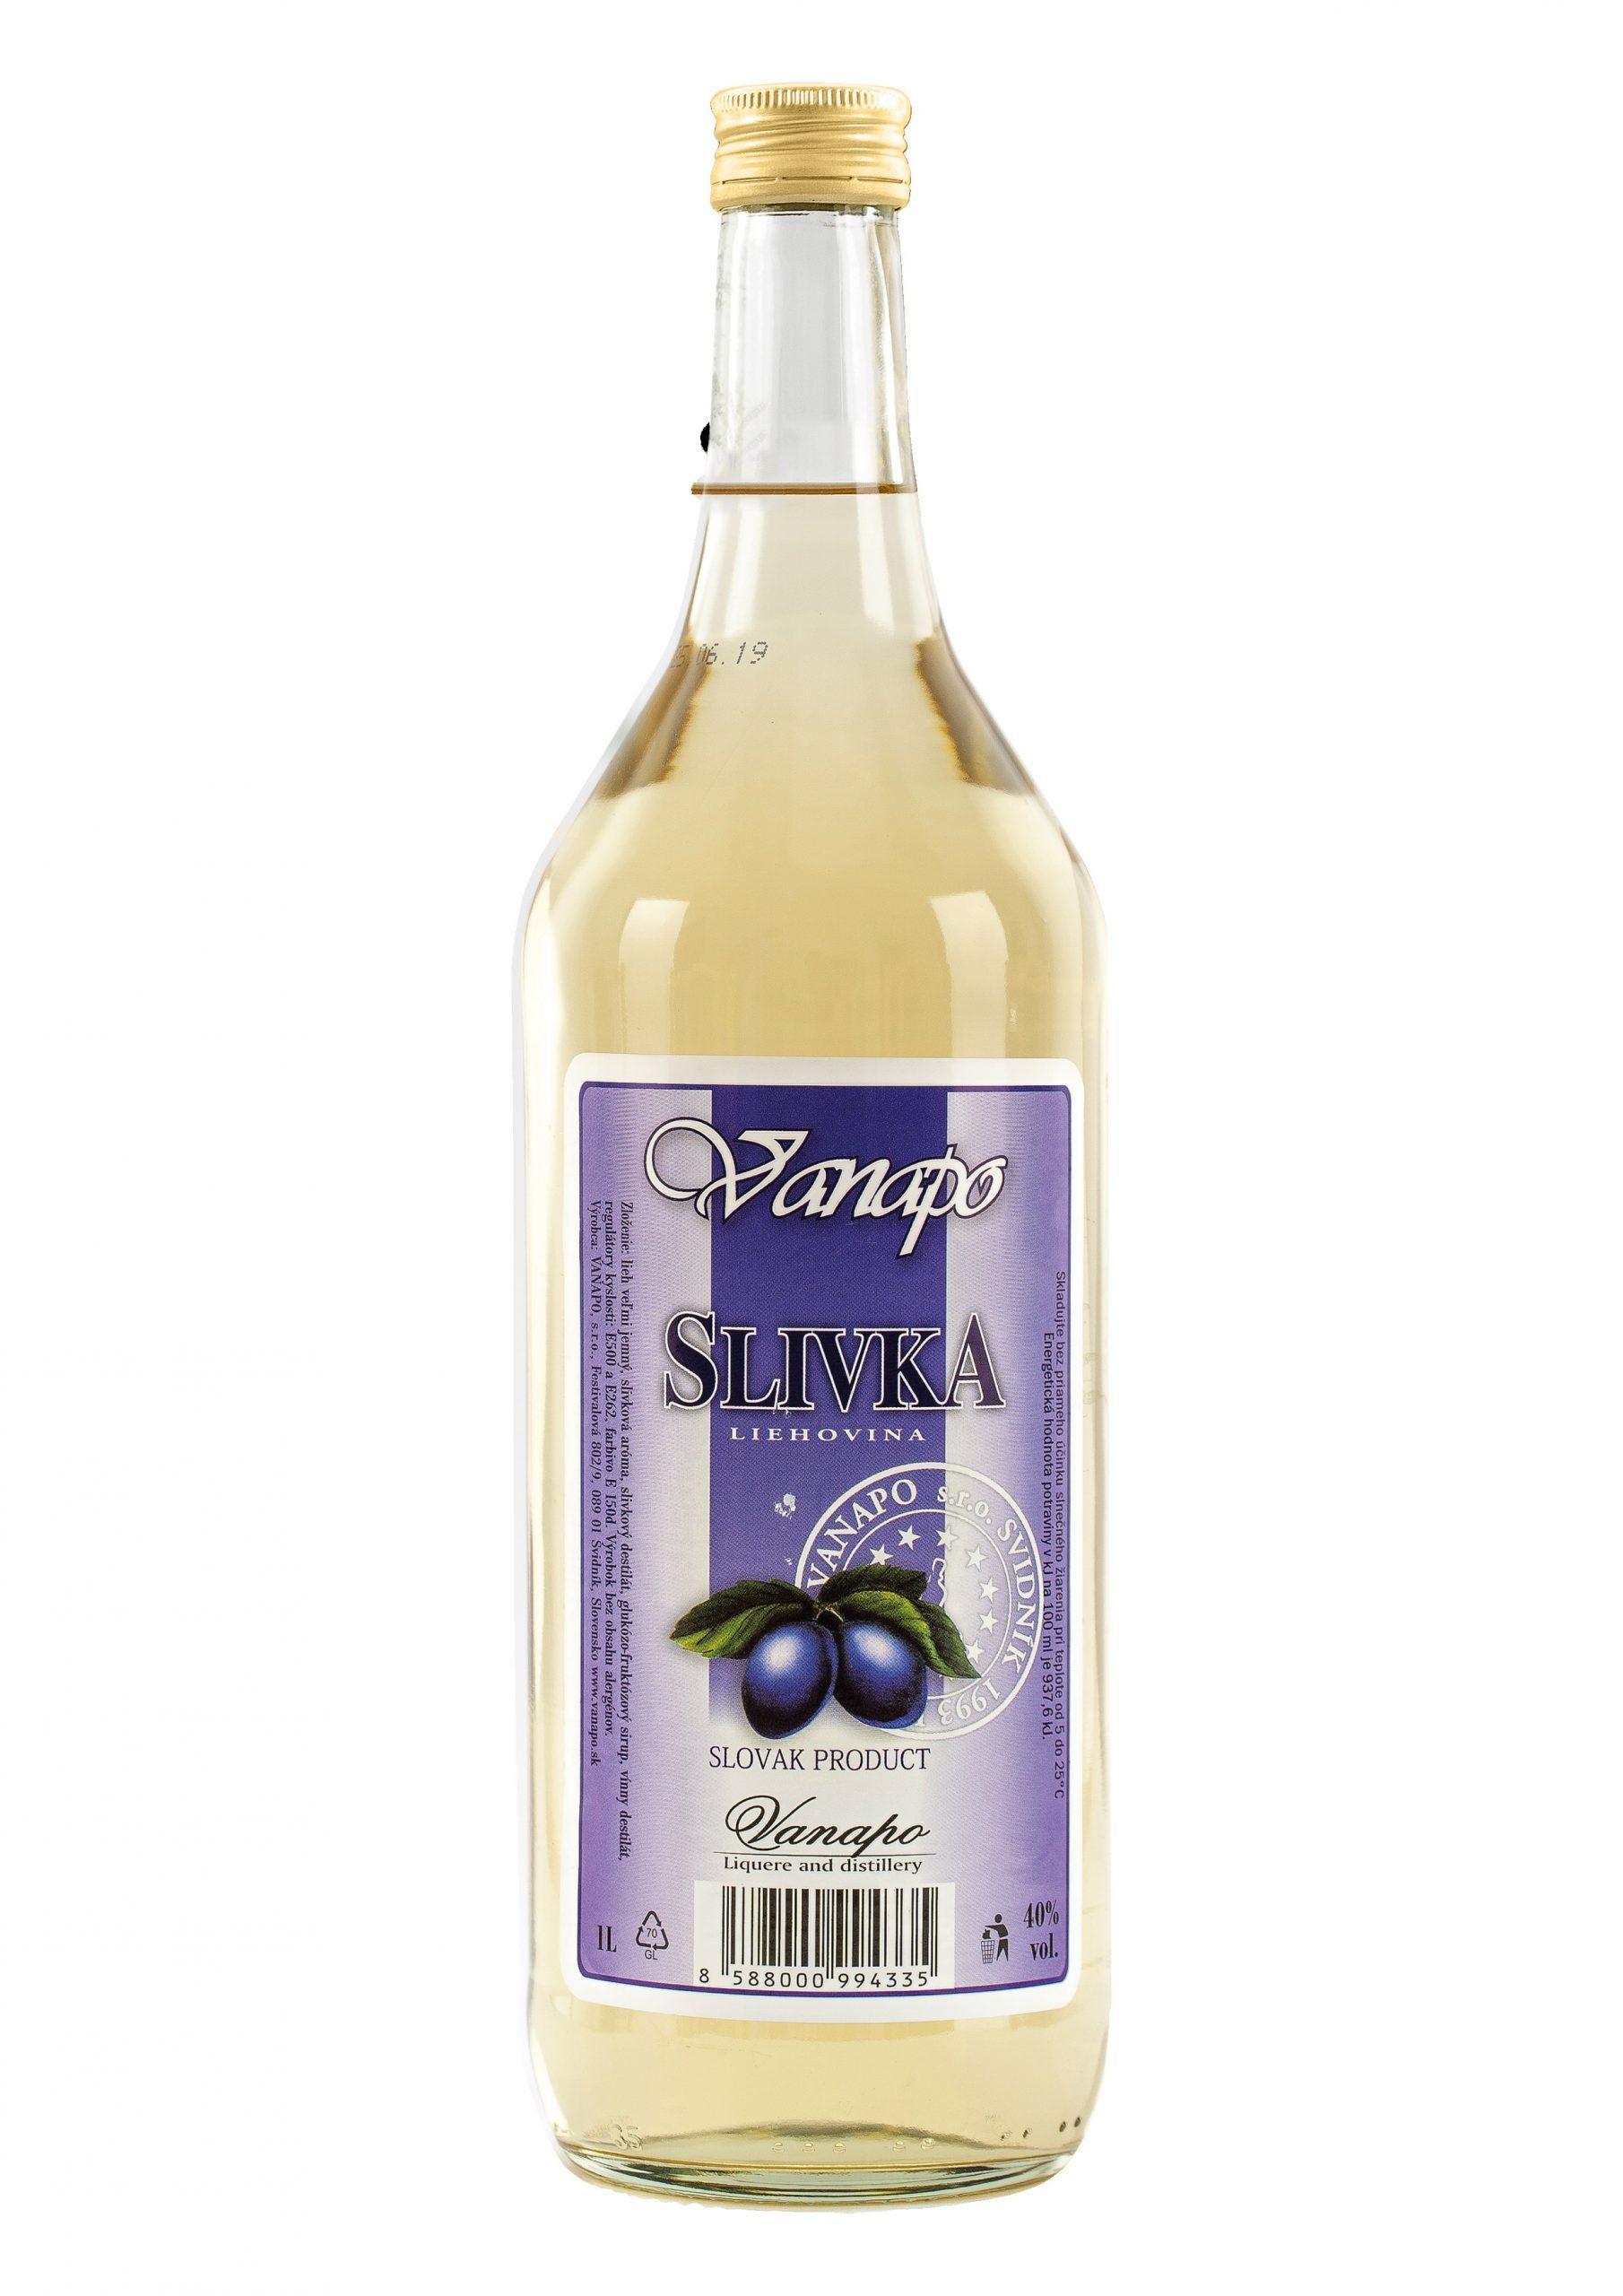 Slivka 40 1L scaled 1 - Slivka